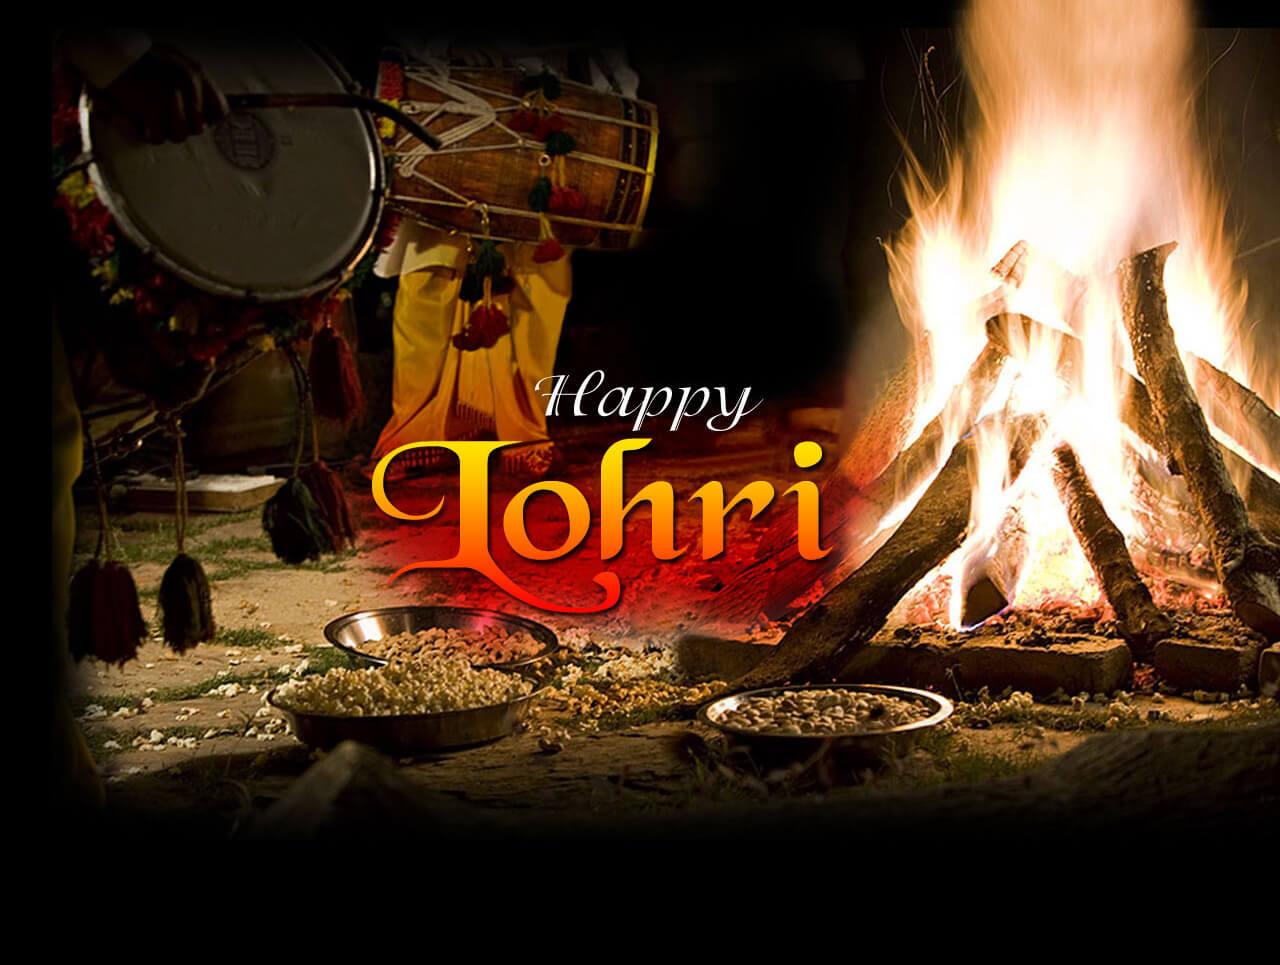 lohri images free download